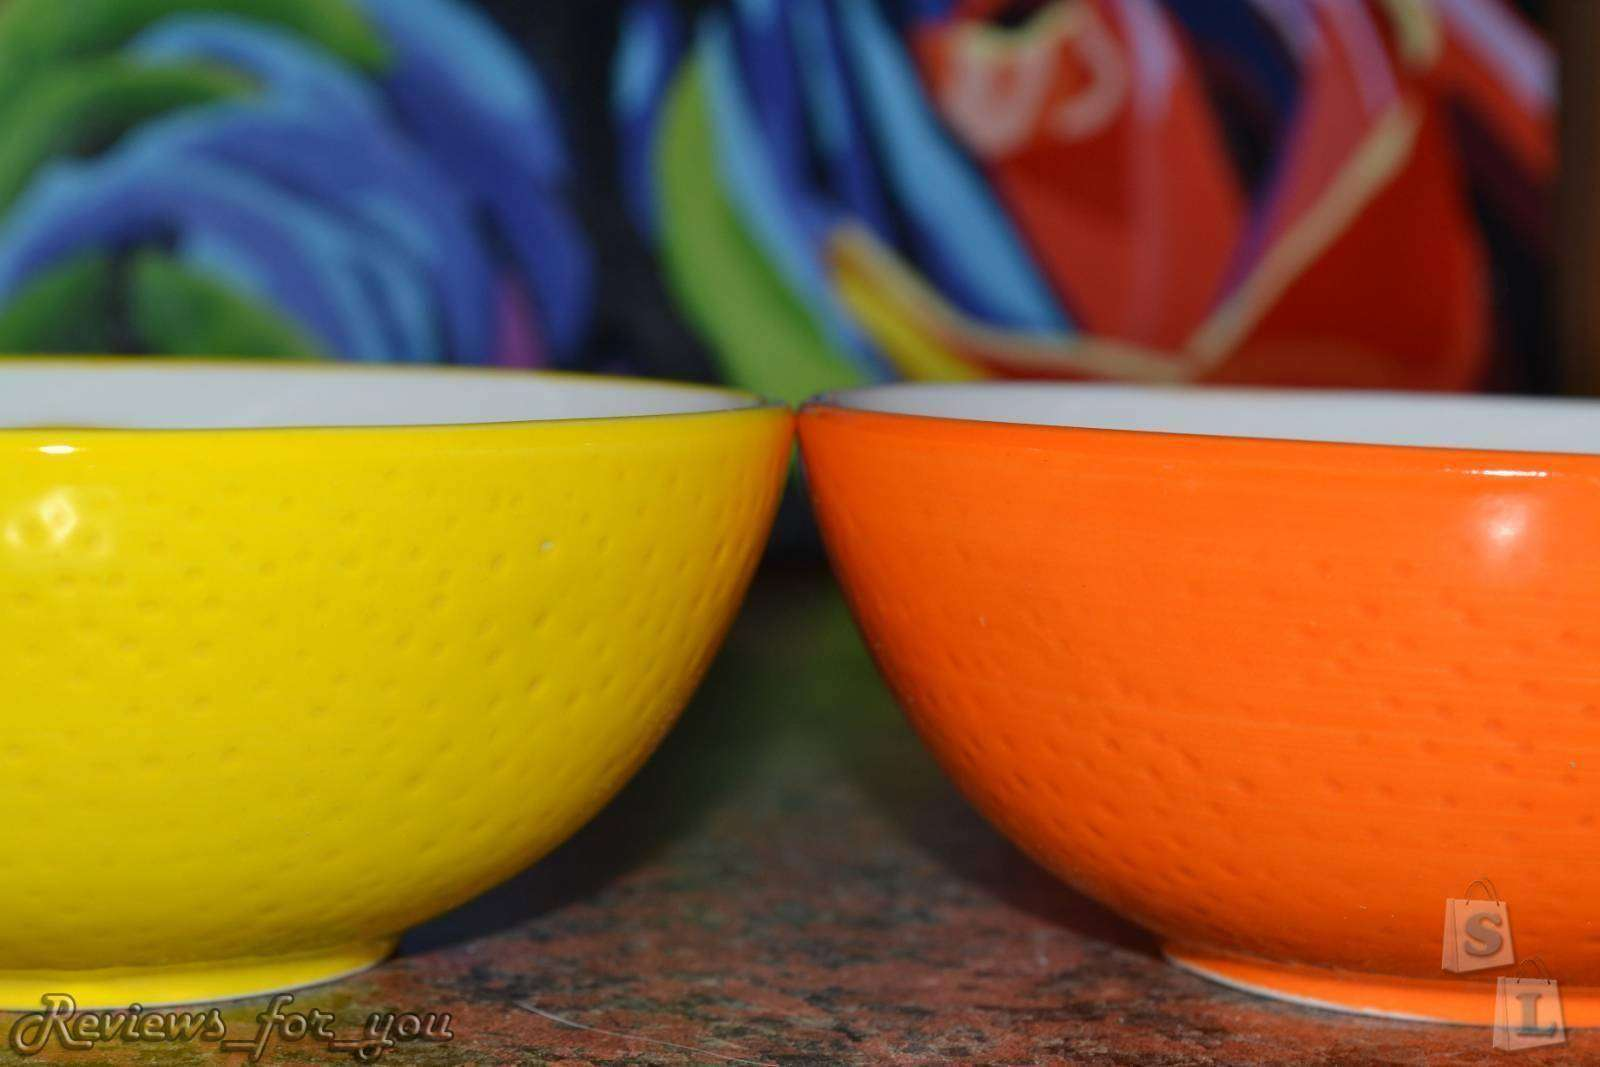 ChinaBuye: Керамический набор из яркой чаши/пиалы и ложки